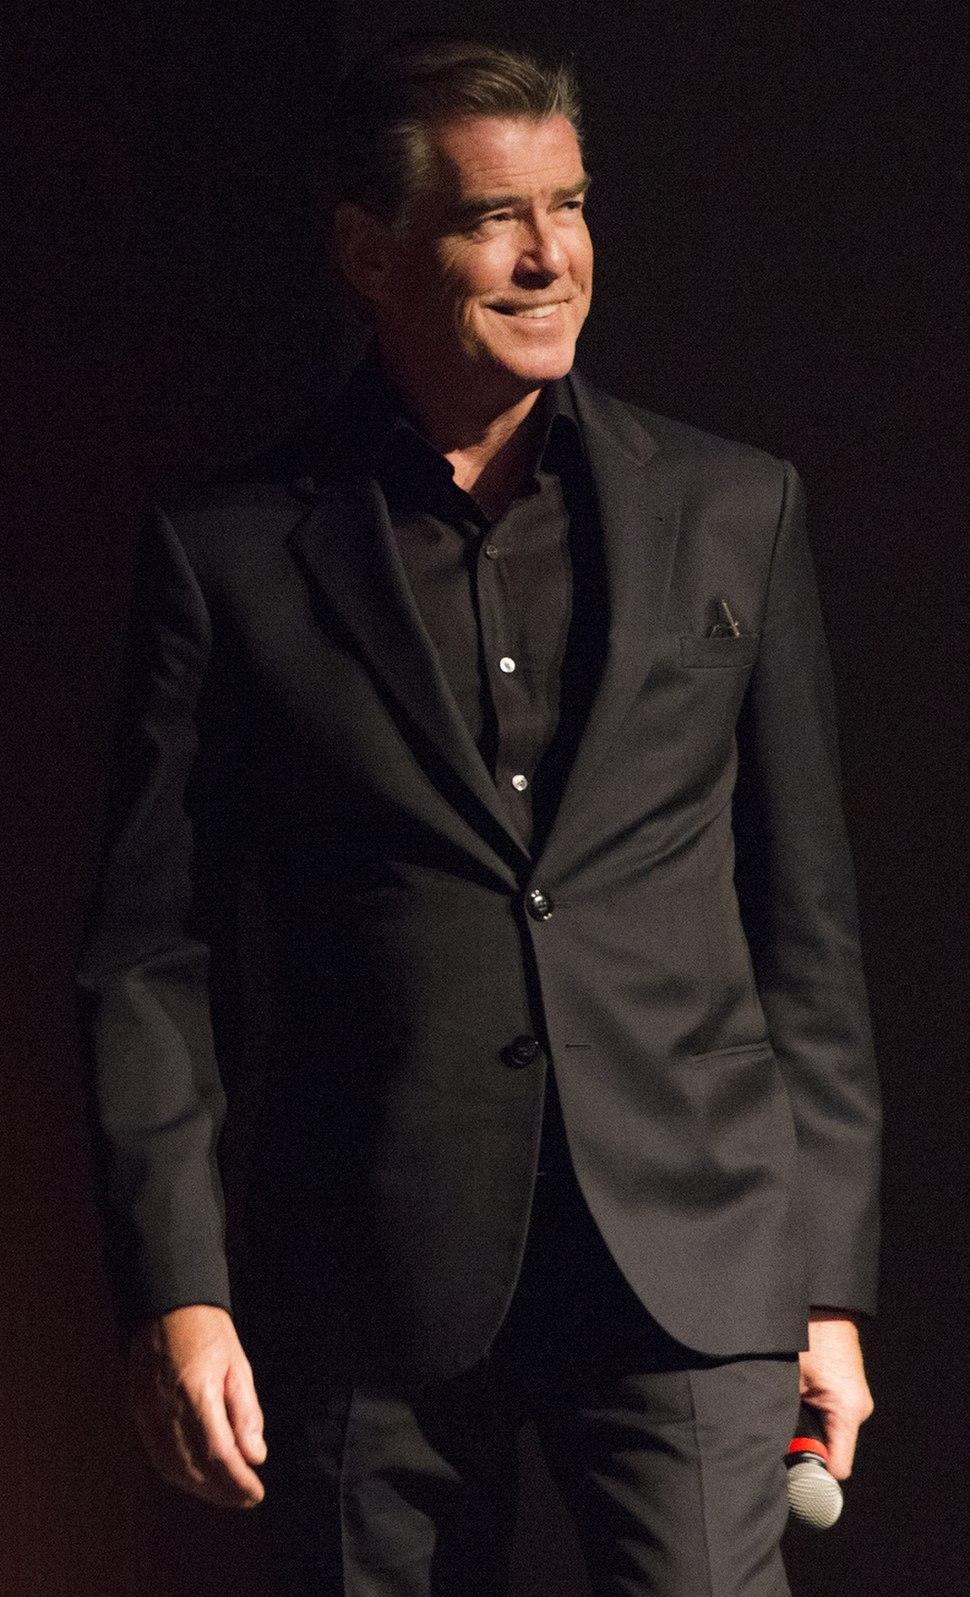 Pierce Brosnan at the LBJ Presidential Library 2017